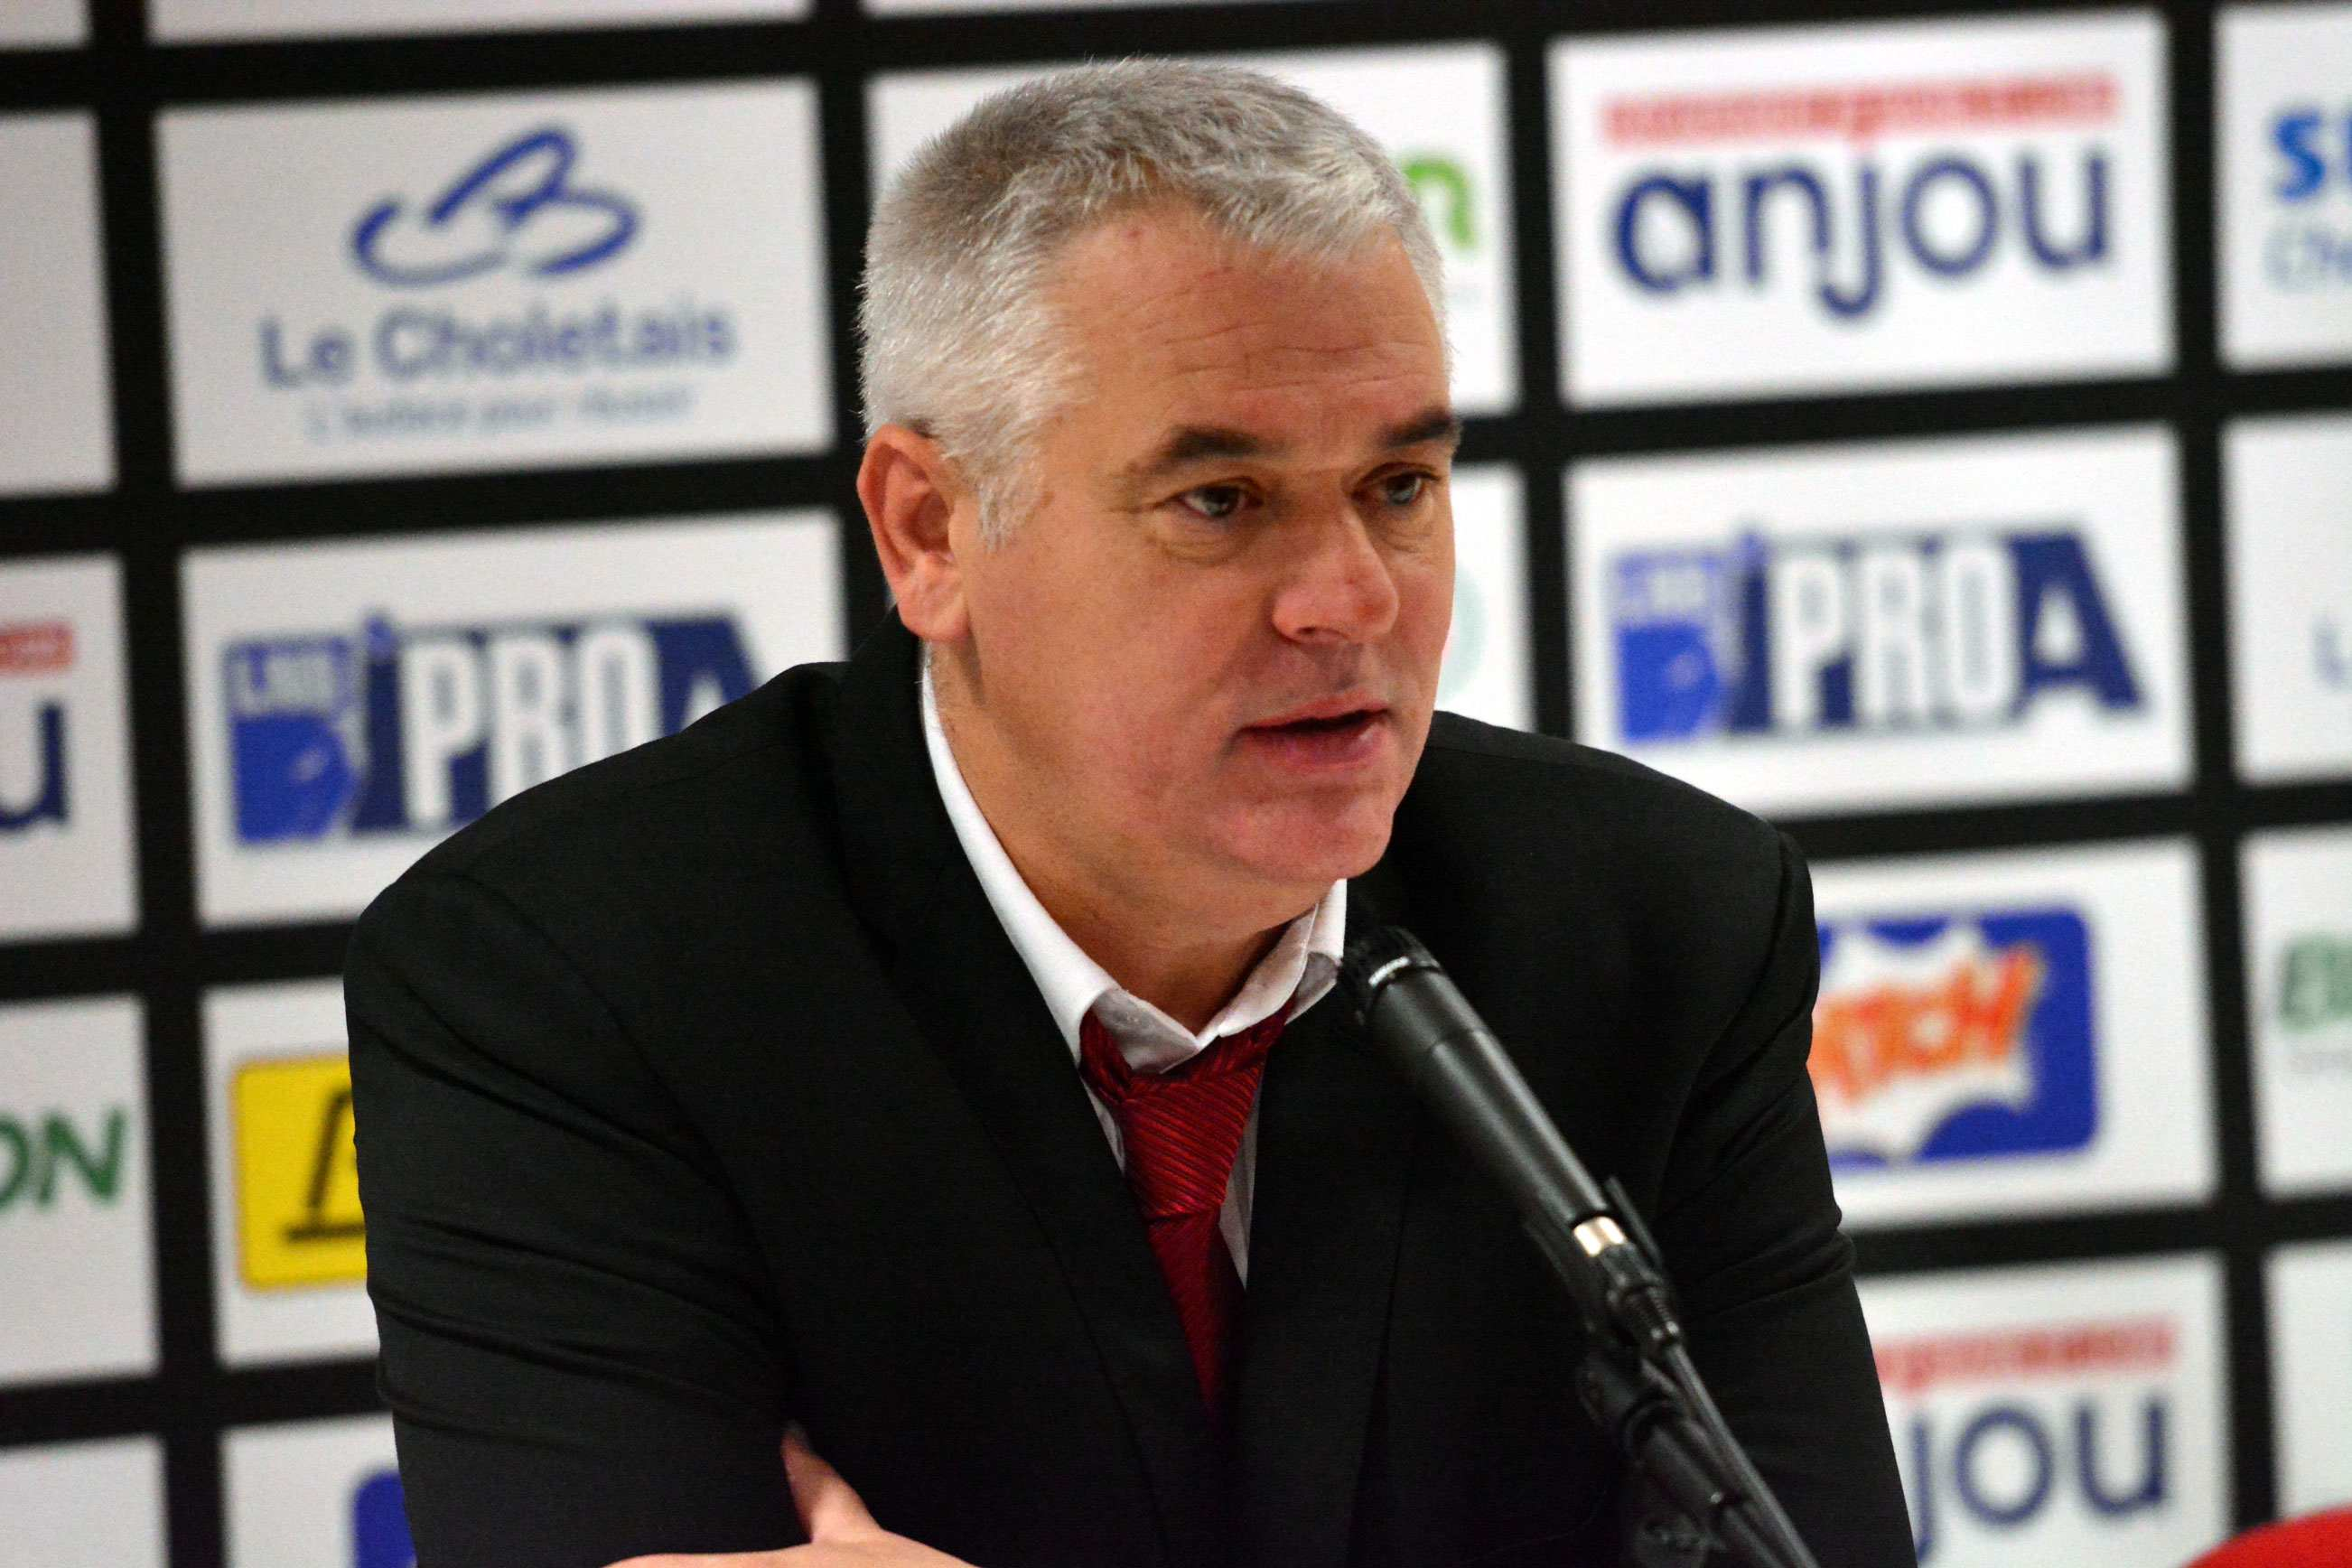 Philippe HERVÉ